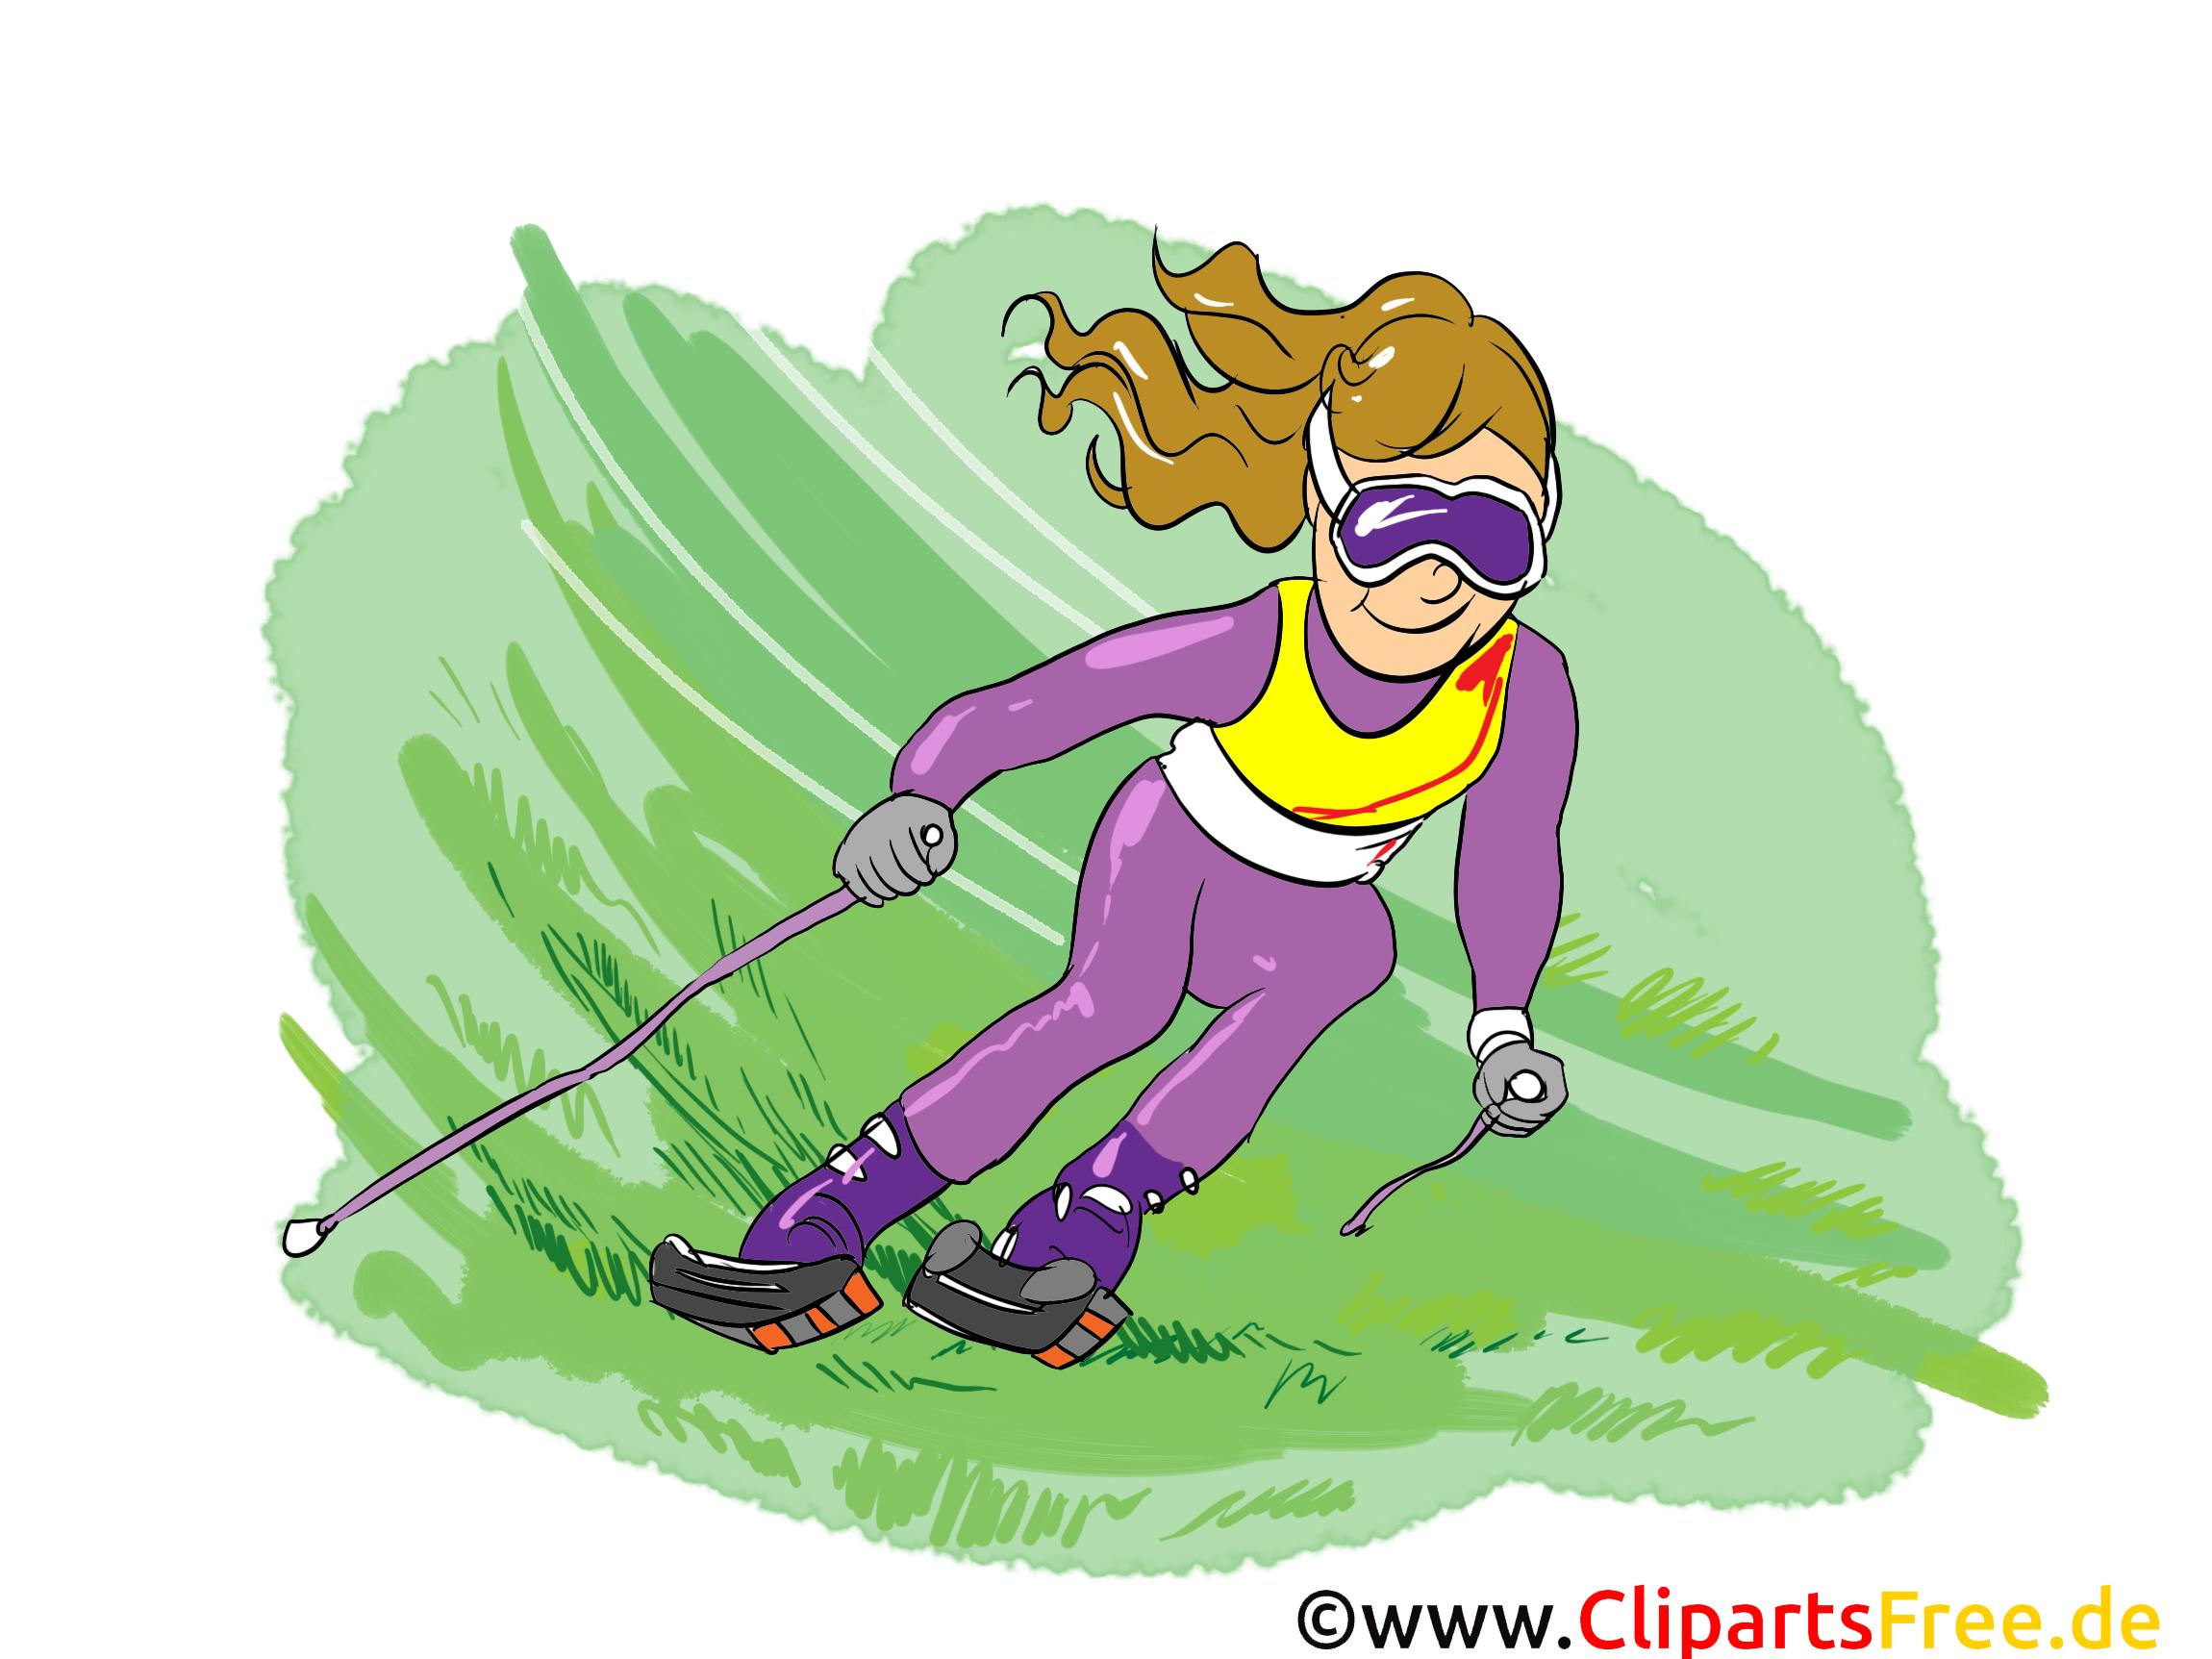 Ski sur herbe illustration images gratuites